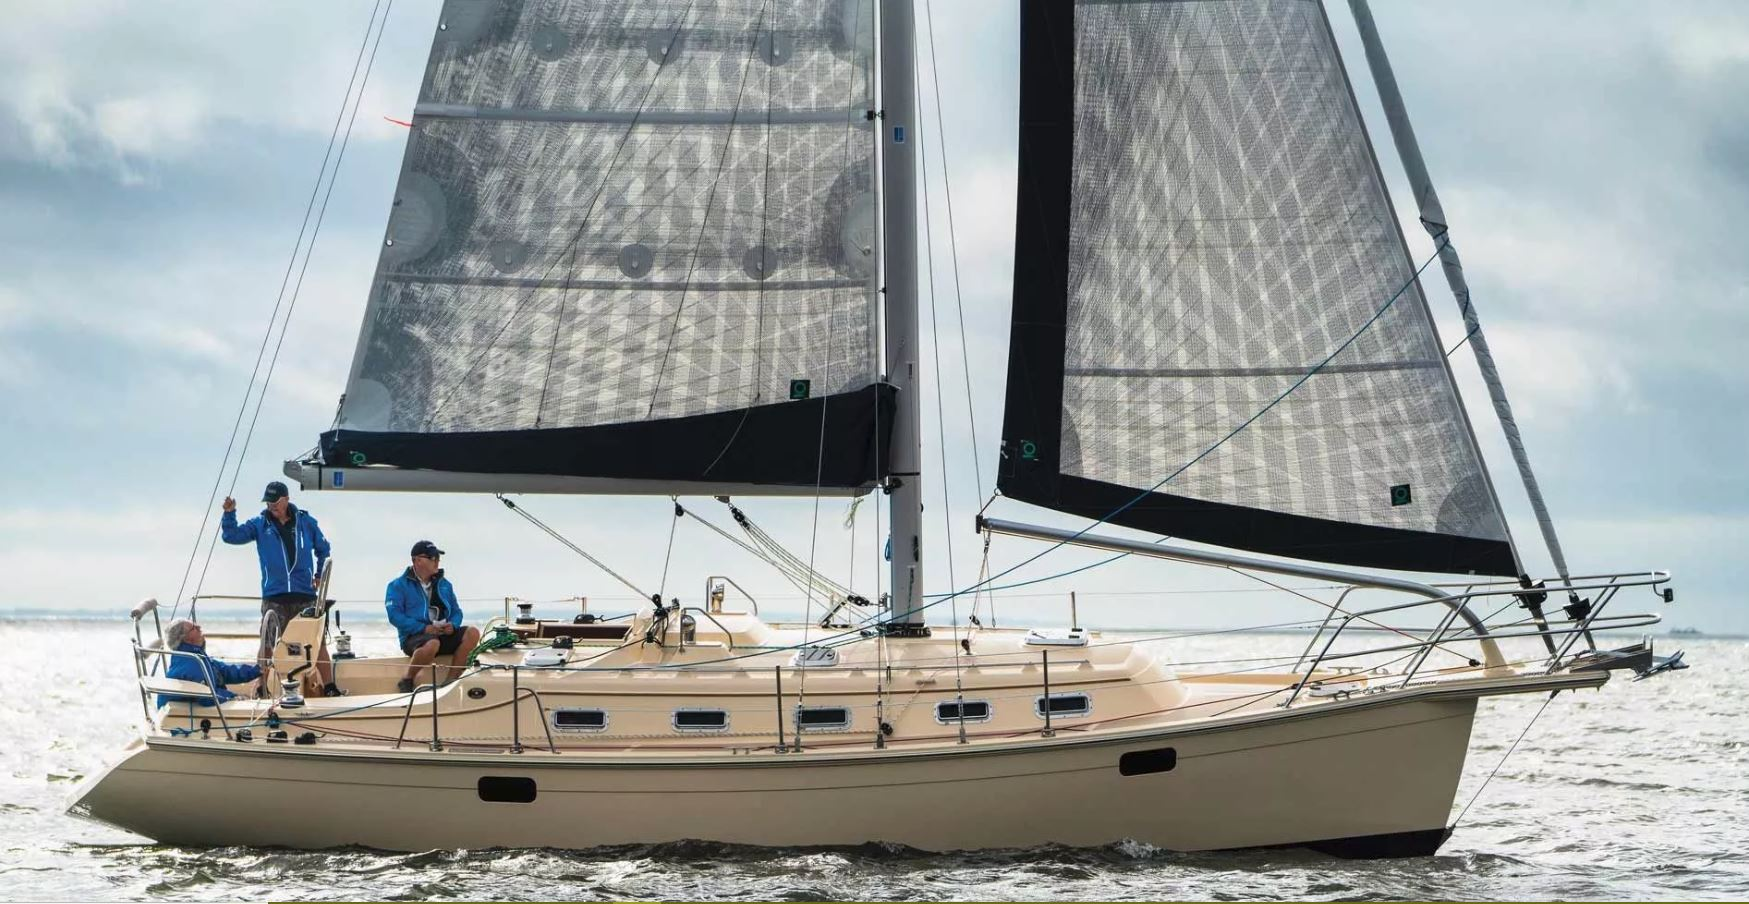 Island Packet 349 - Cruising World Boat of the Year 2019 x 2